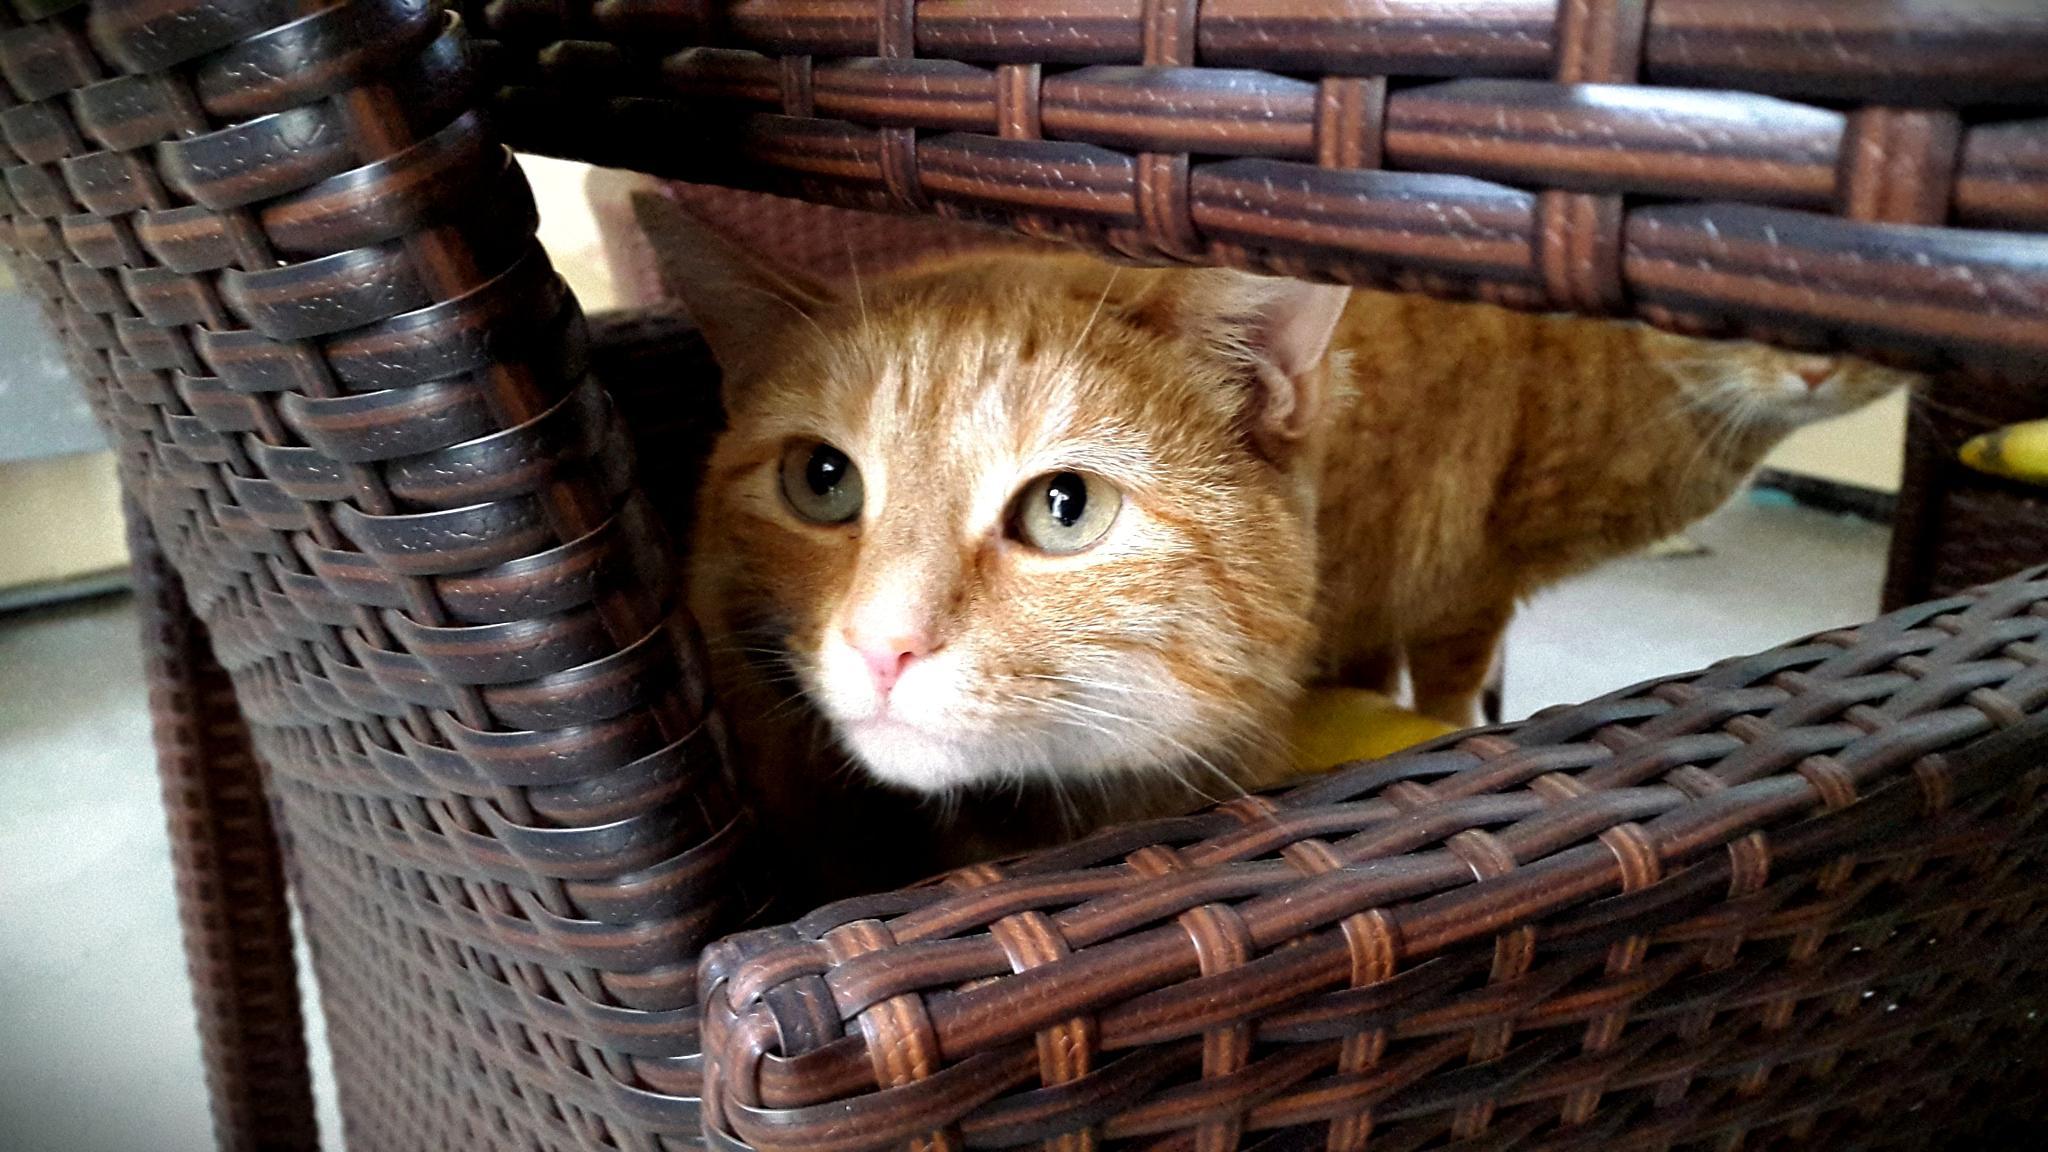 curious kitten by Chillotti Alessandro